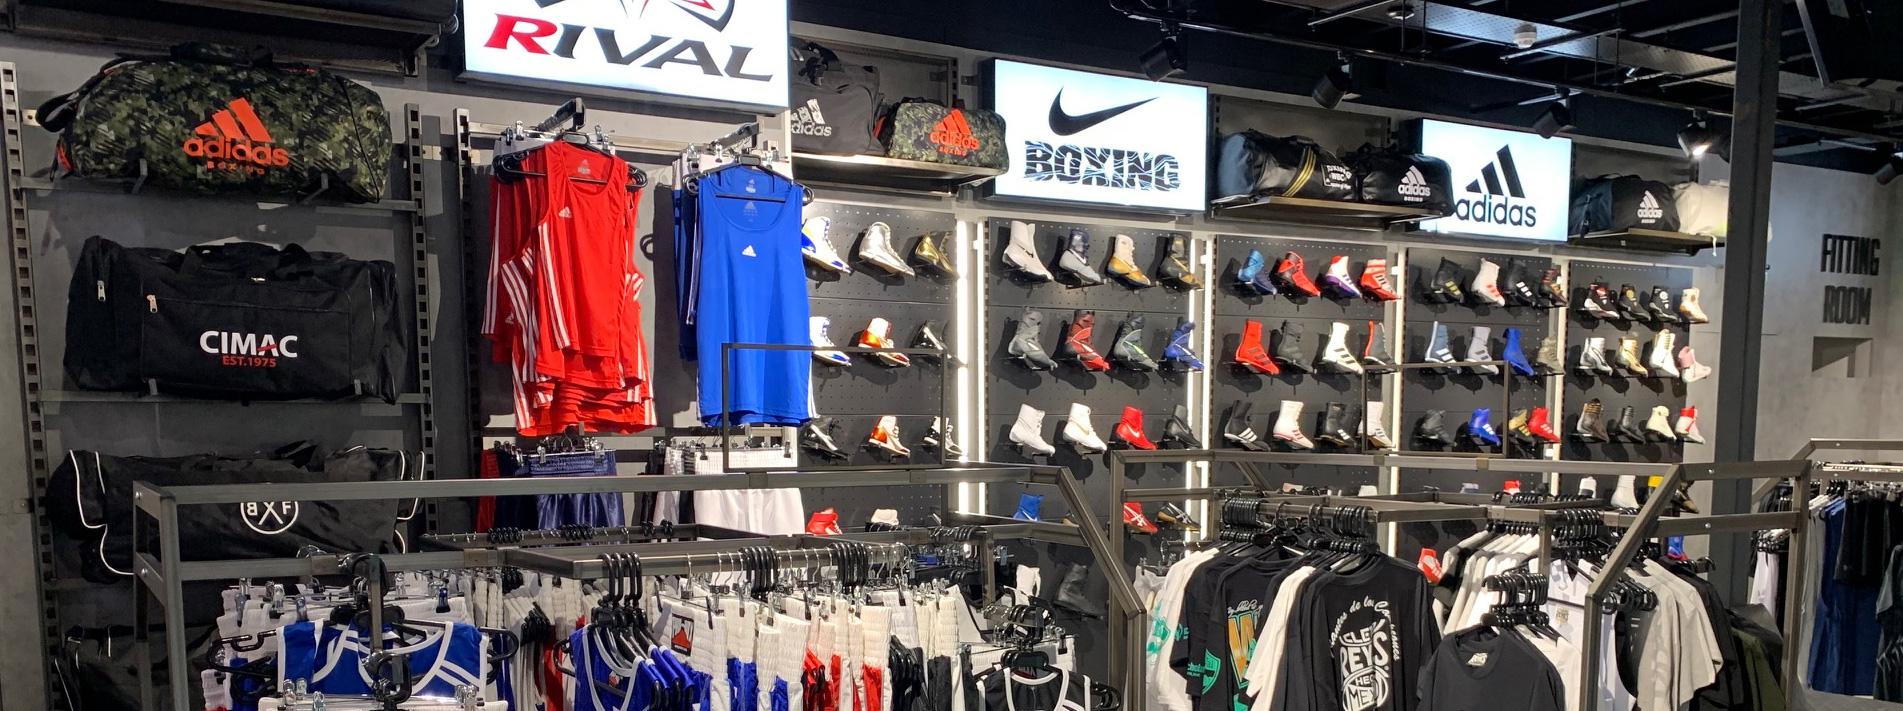 Bespoke Shopfitting Systems